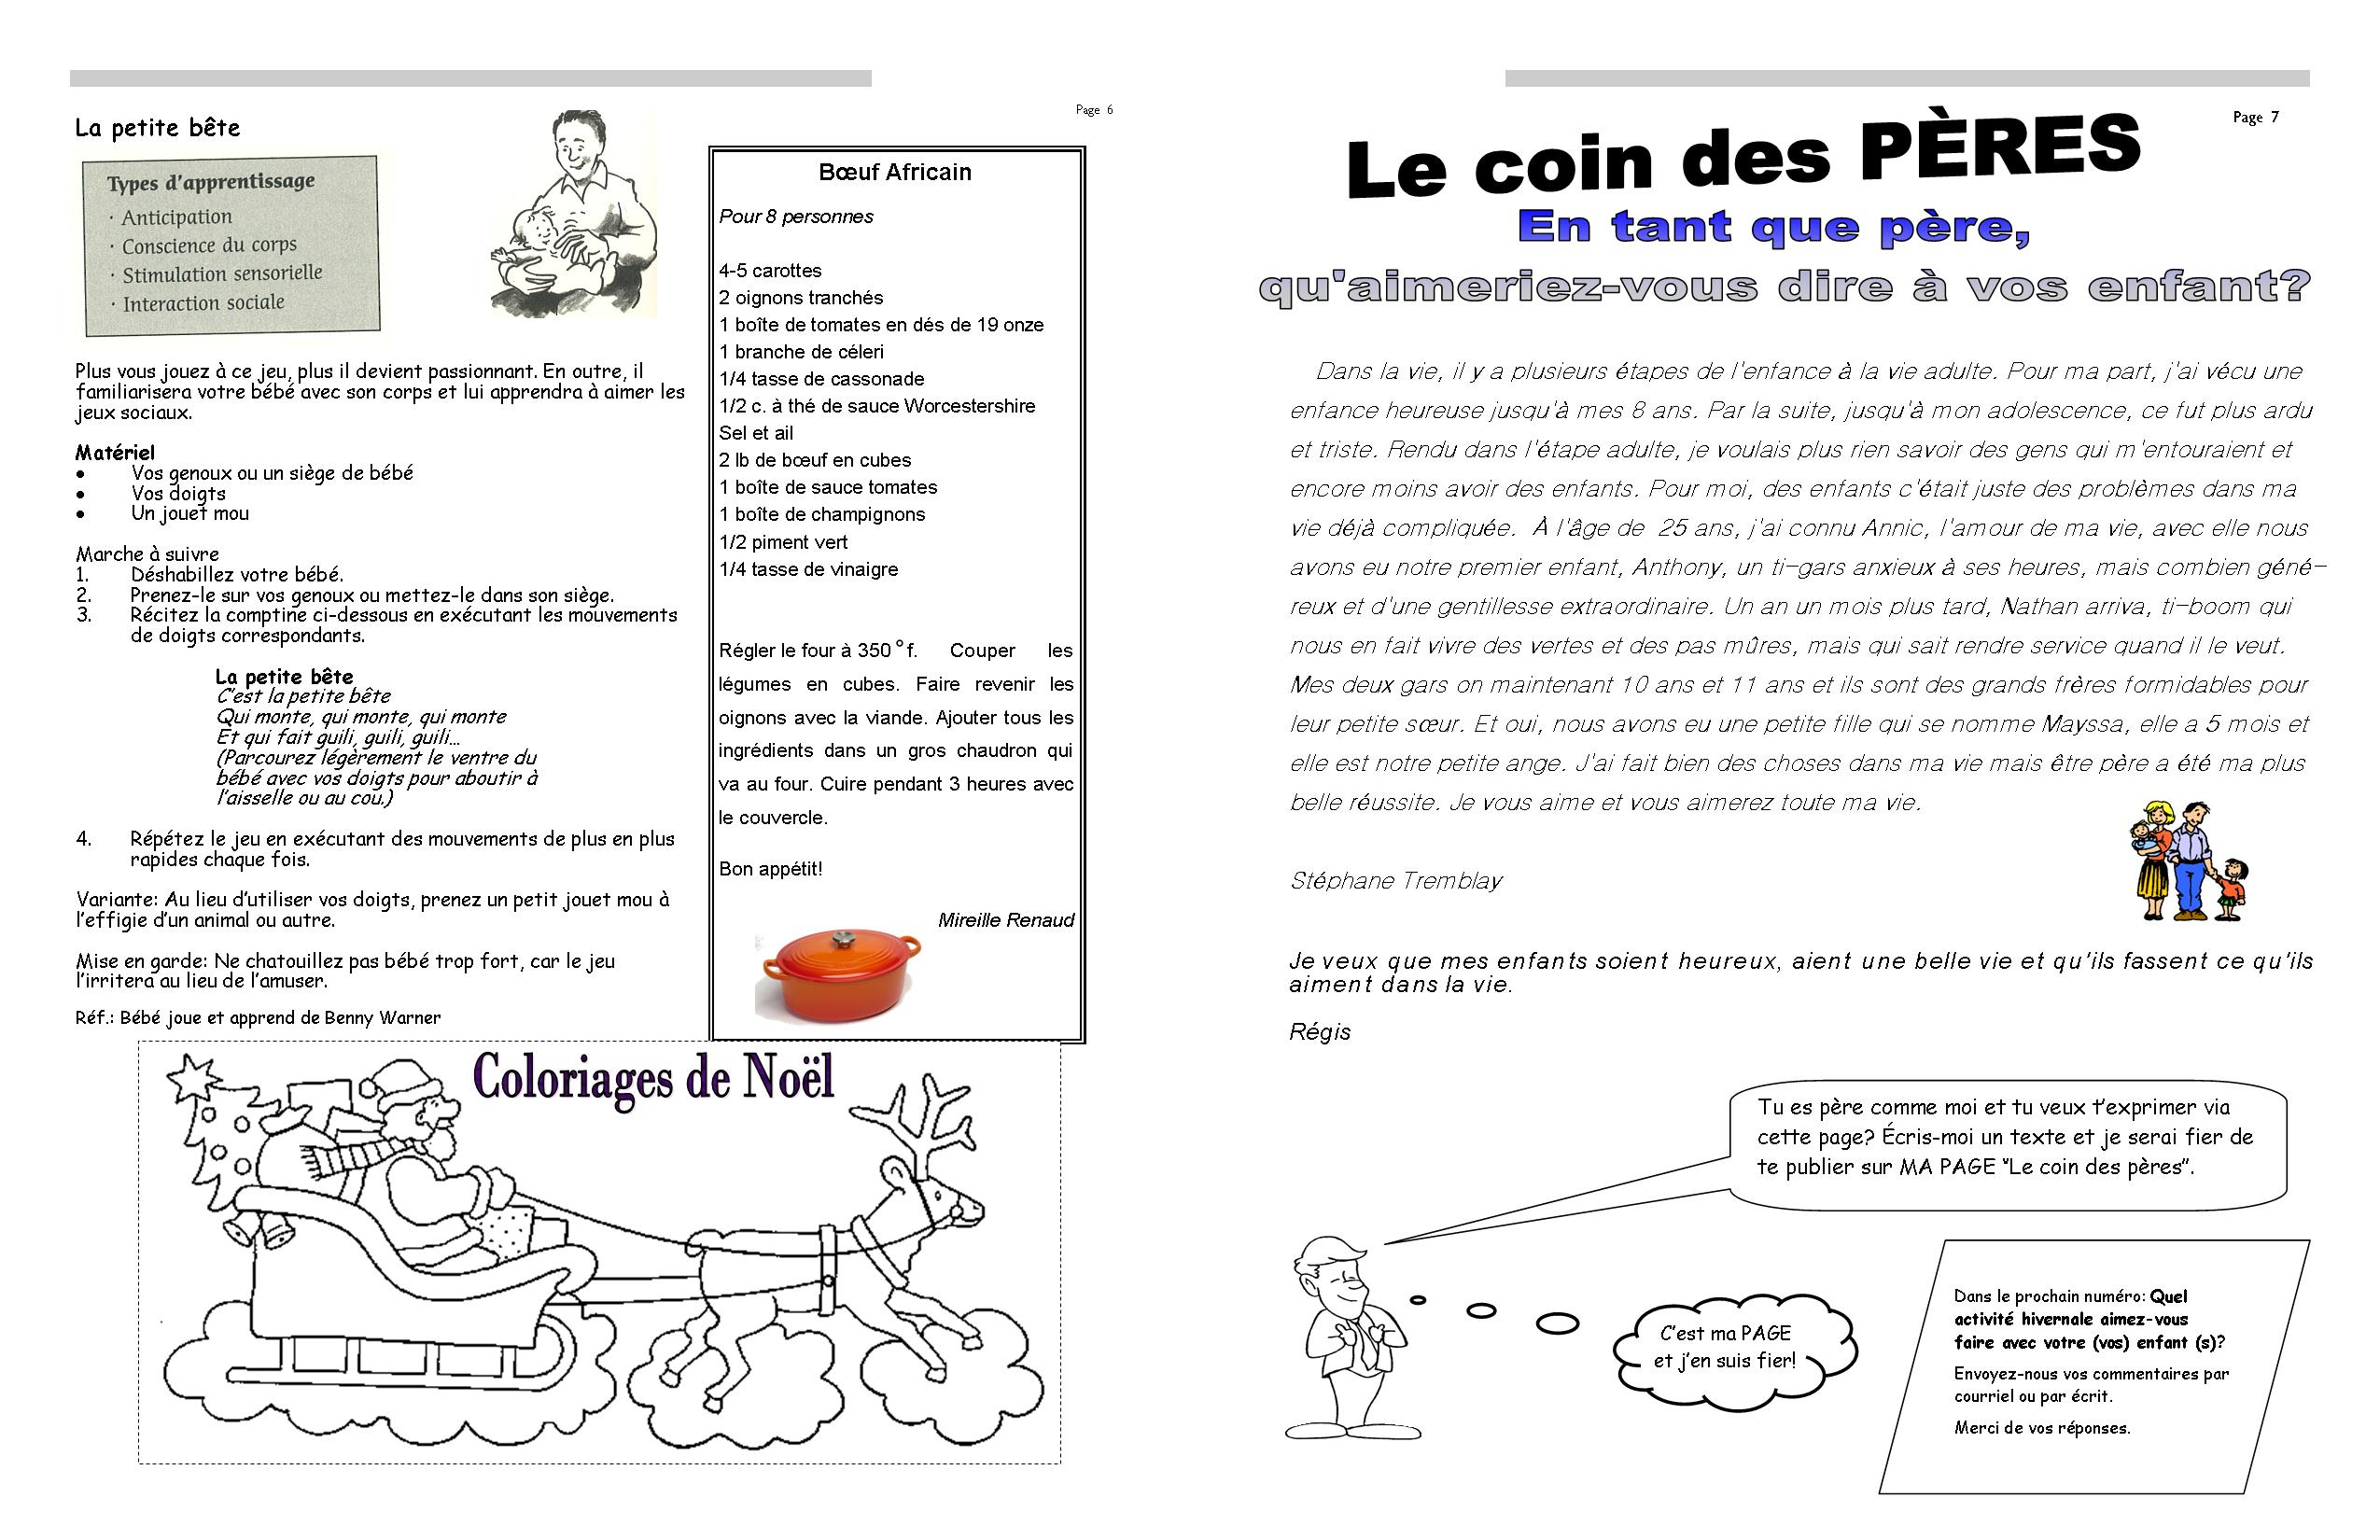 Info-Nichée été-automne 2015 p.6-7